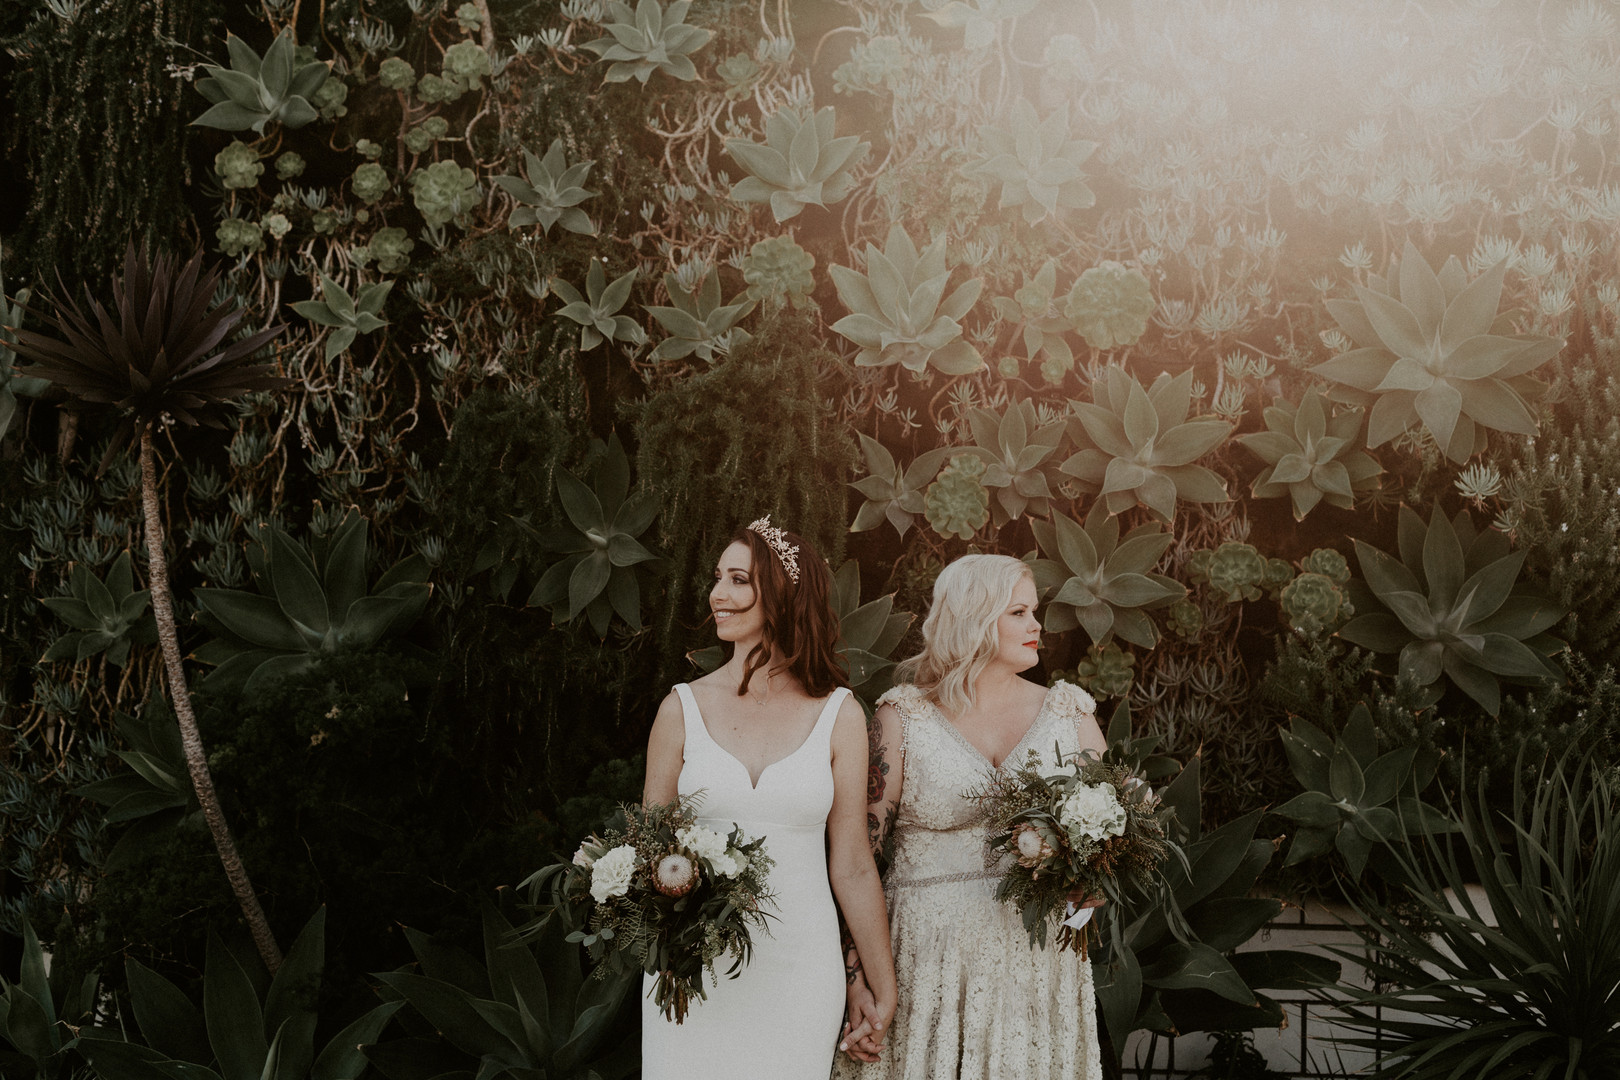 Marceil & Katy